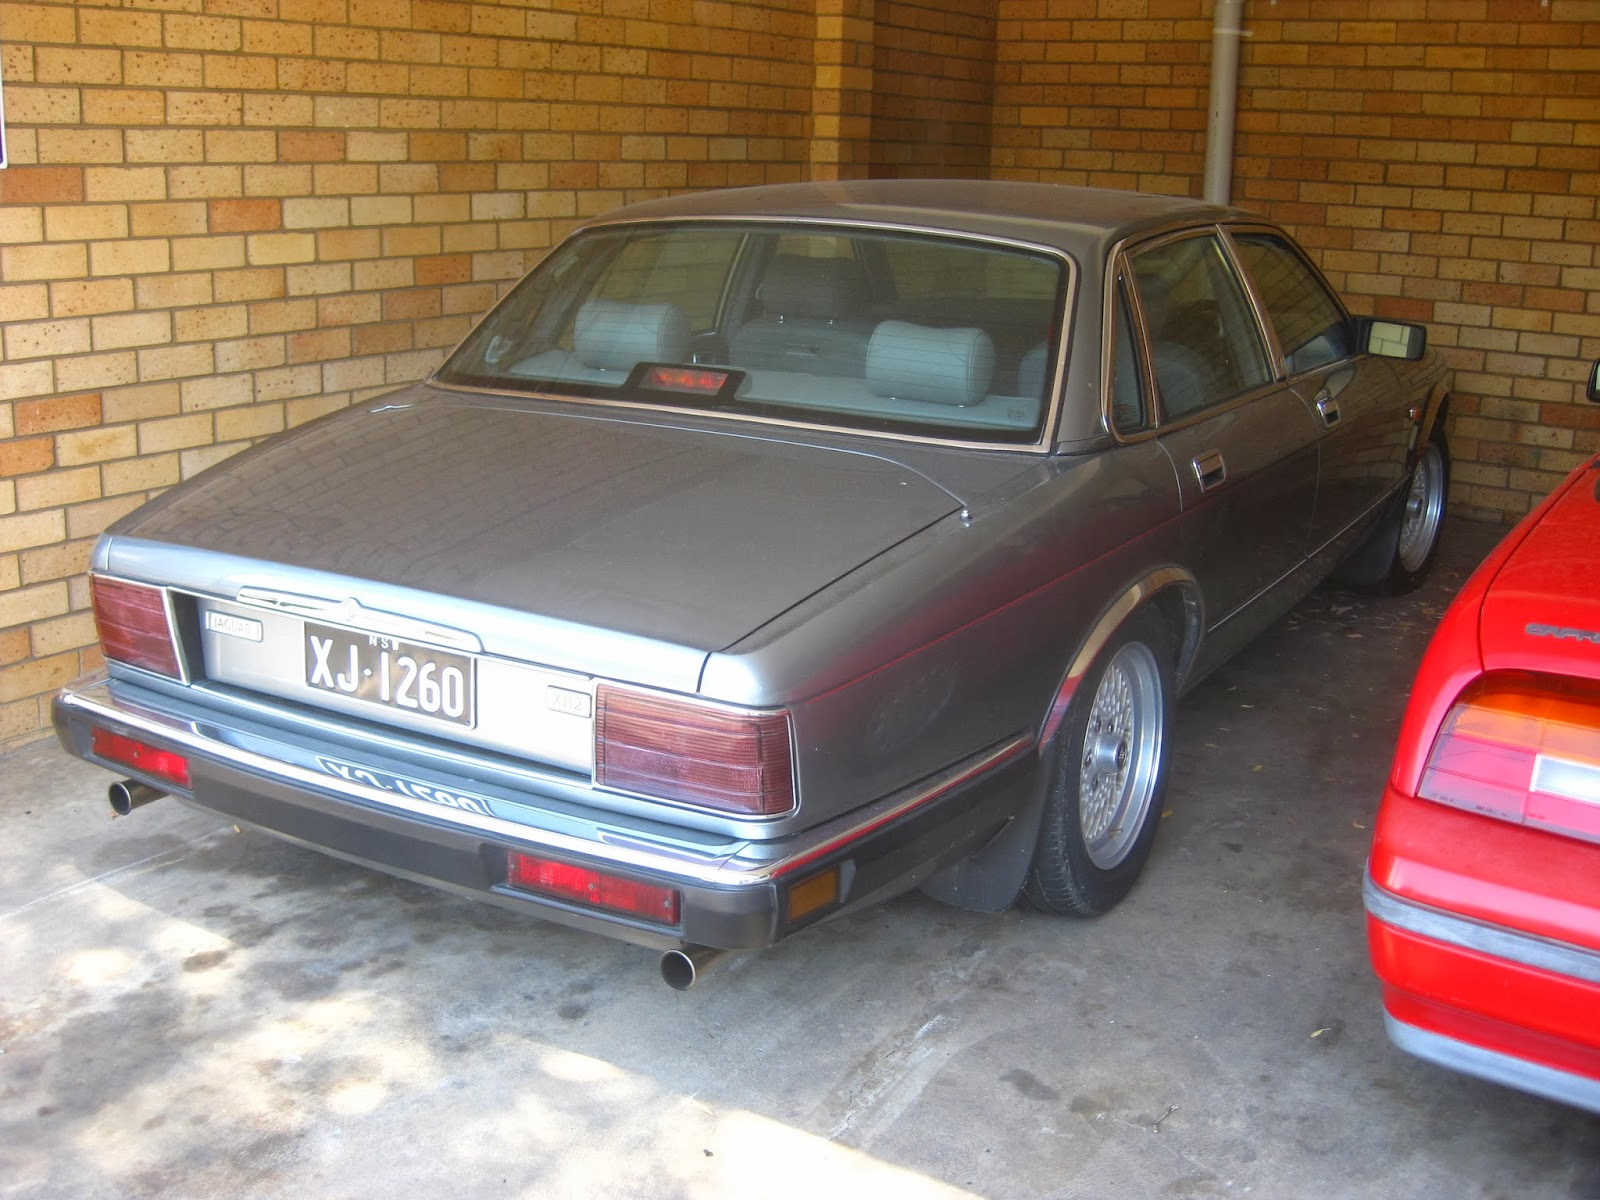 Aussie Old Parked Cars: 1993 Jaguar XJ12 (XJ40)